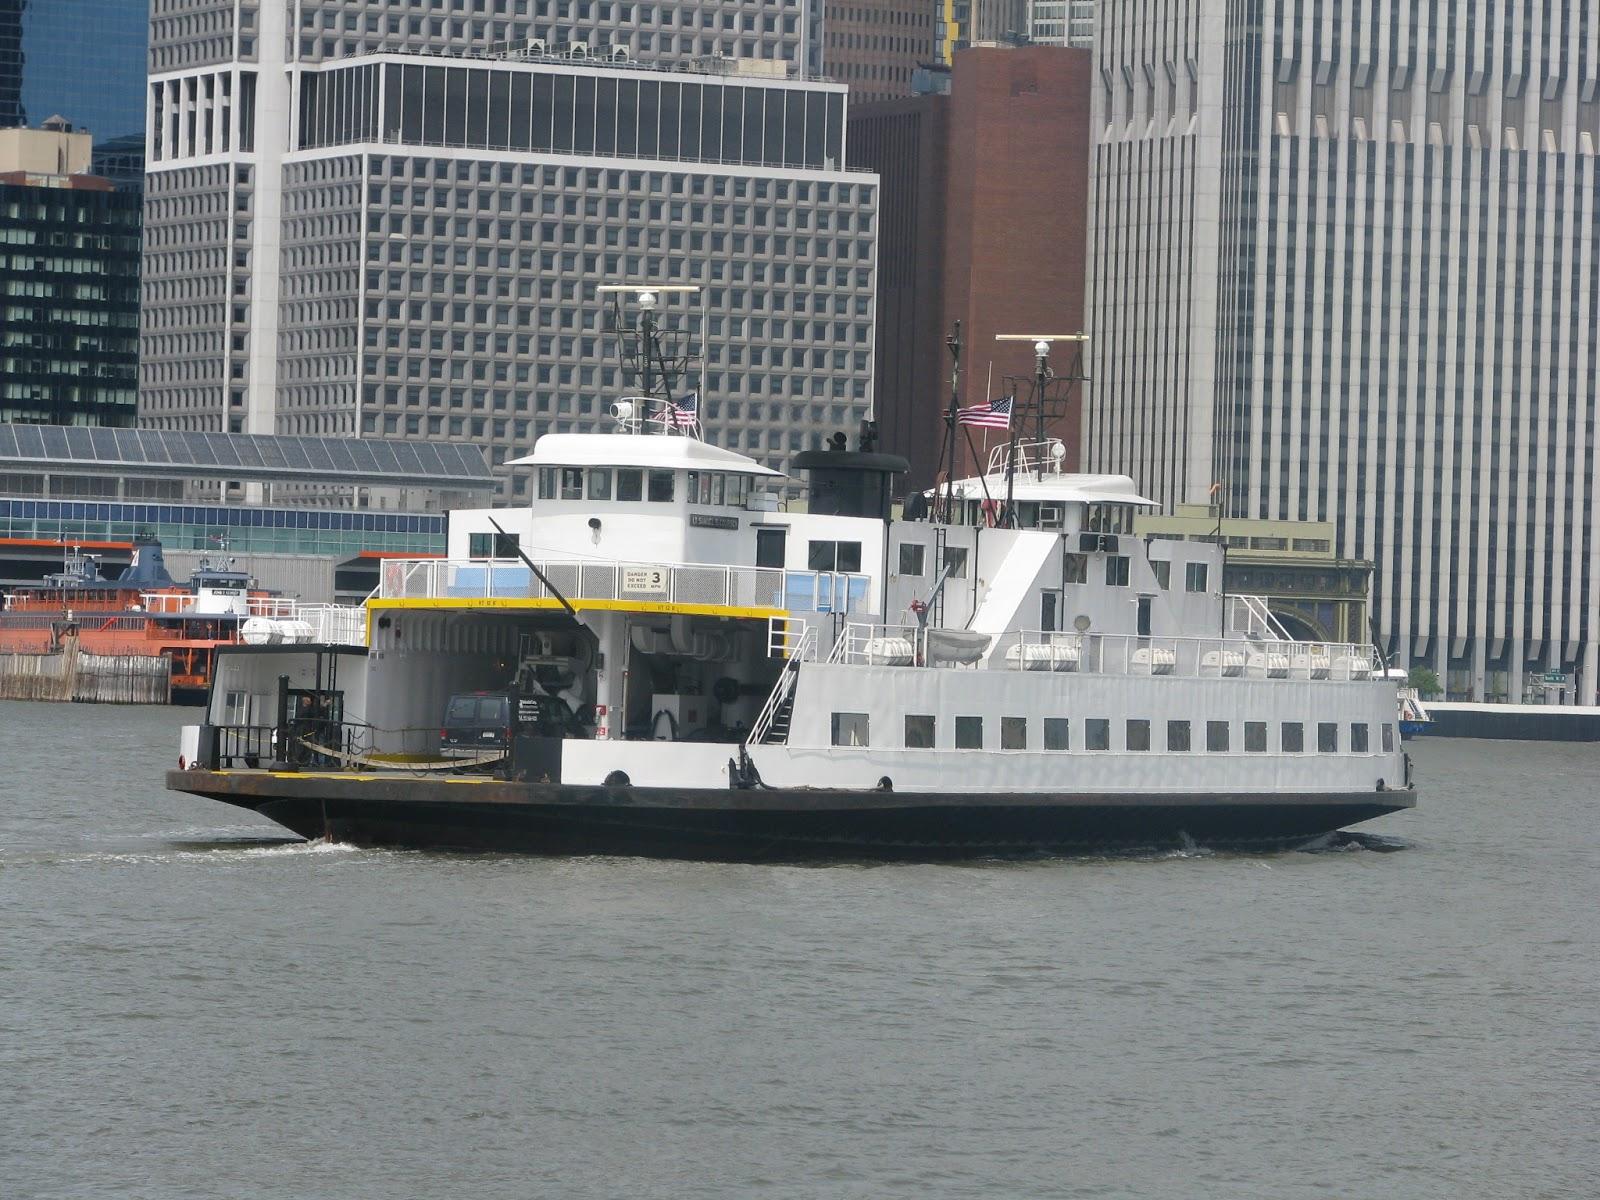 LT SAMUEL S COURSEN - Governor's Island Ferry - in New Yor… | Flickr